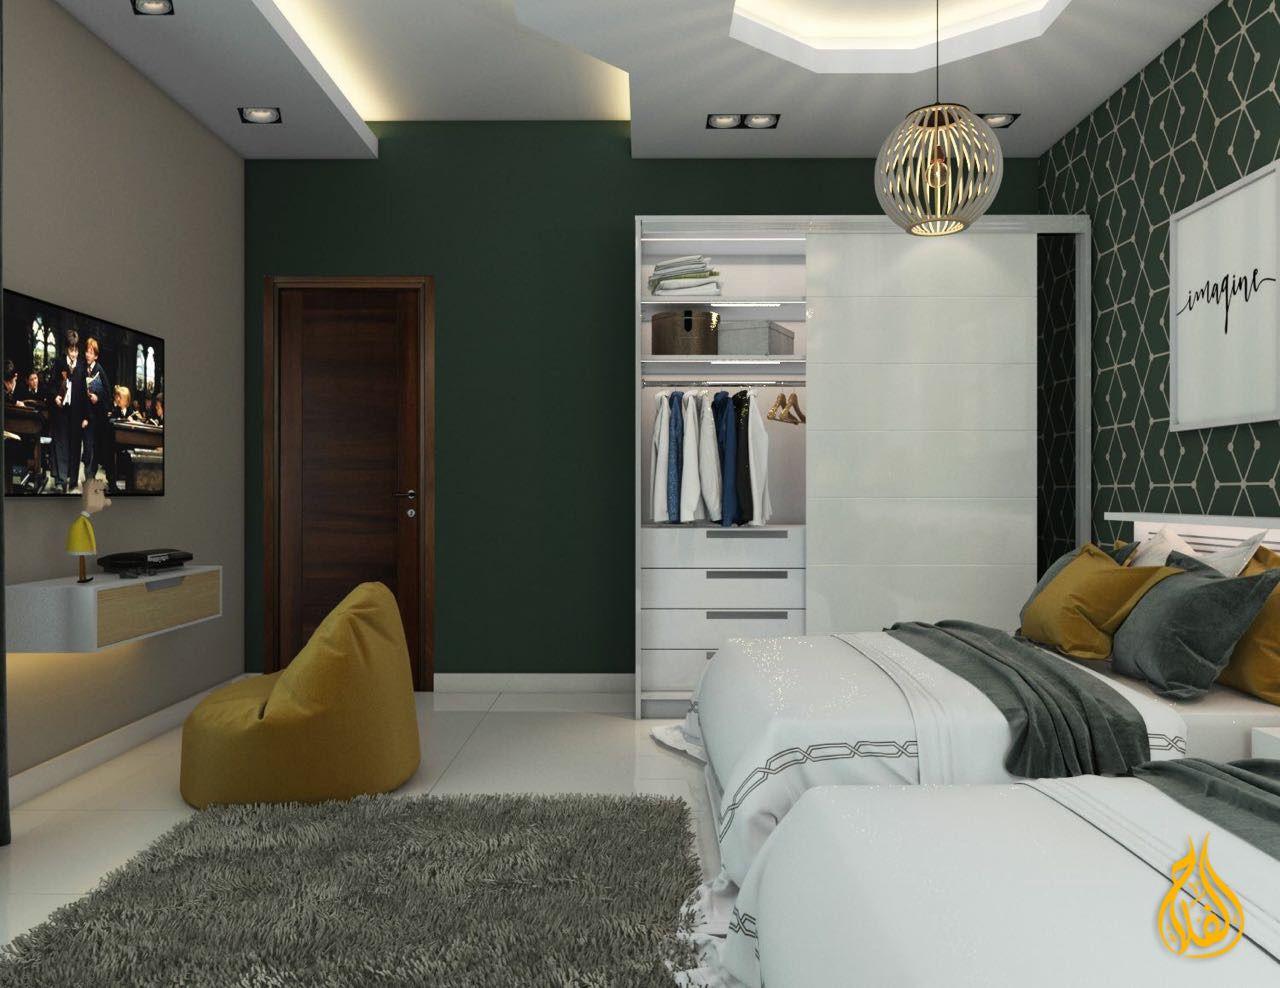 Contemporary Boyroom Design تصميم و تنفيذ غرفه نوم من الفلاح جروب Designed And Implemented By Alfalahgroup Phone Number Girls Bedroom Home Home Decor